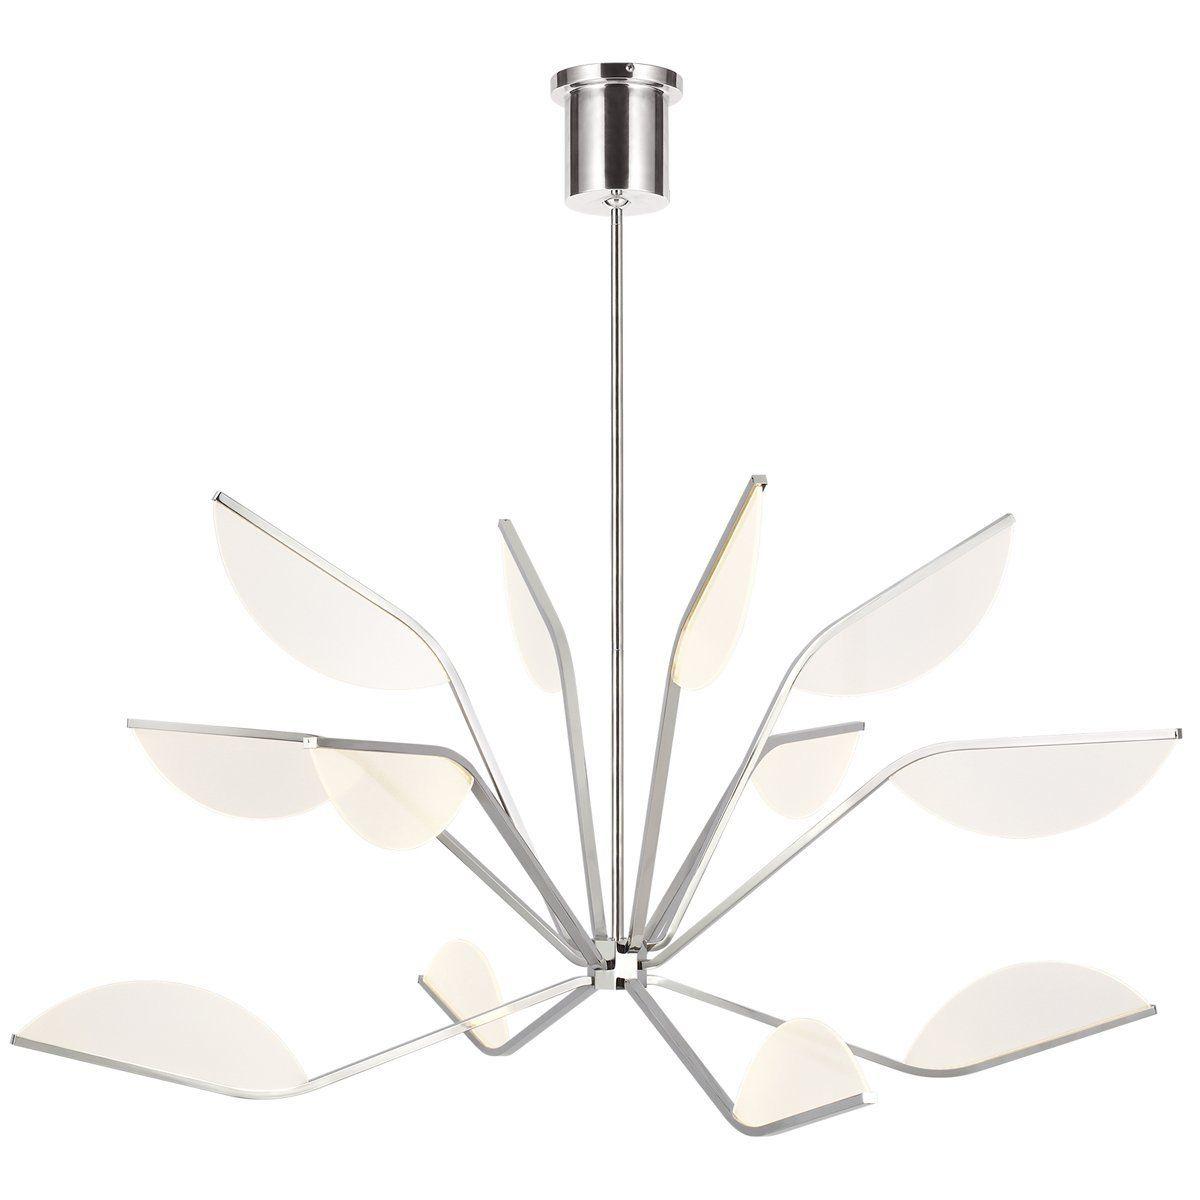 Belterra Chandelier Tech Lighting Chandelier Ceiling Lights Chandelier Chandelier Design